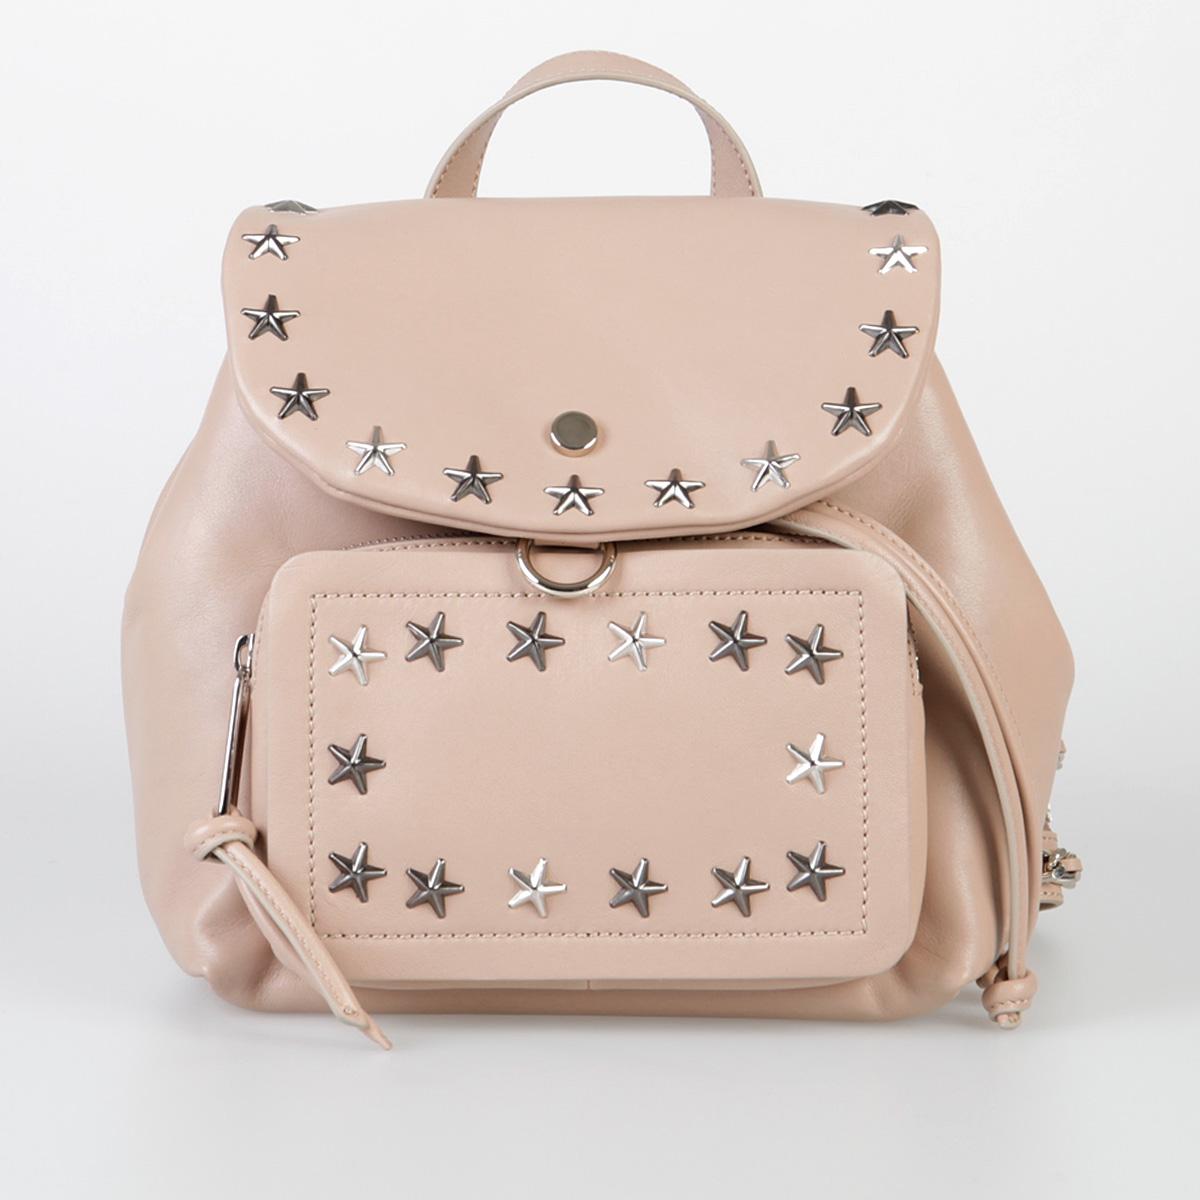 eb085d5f049 Jimmy Choo Women Leather SUKI Backpack - Glamood Outlet